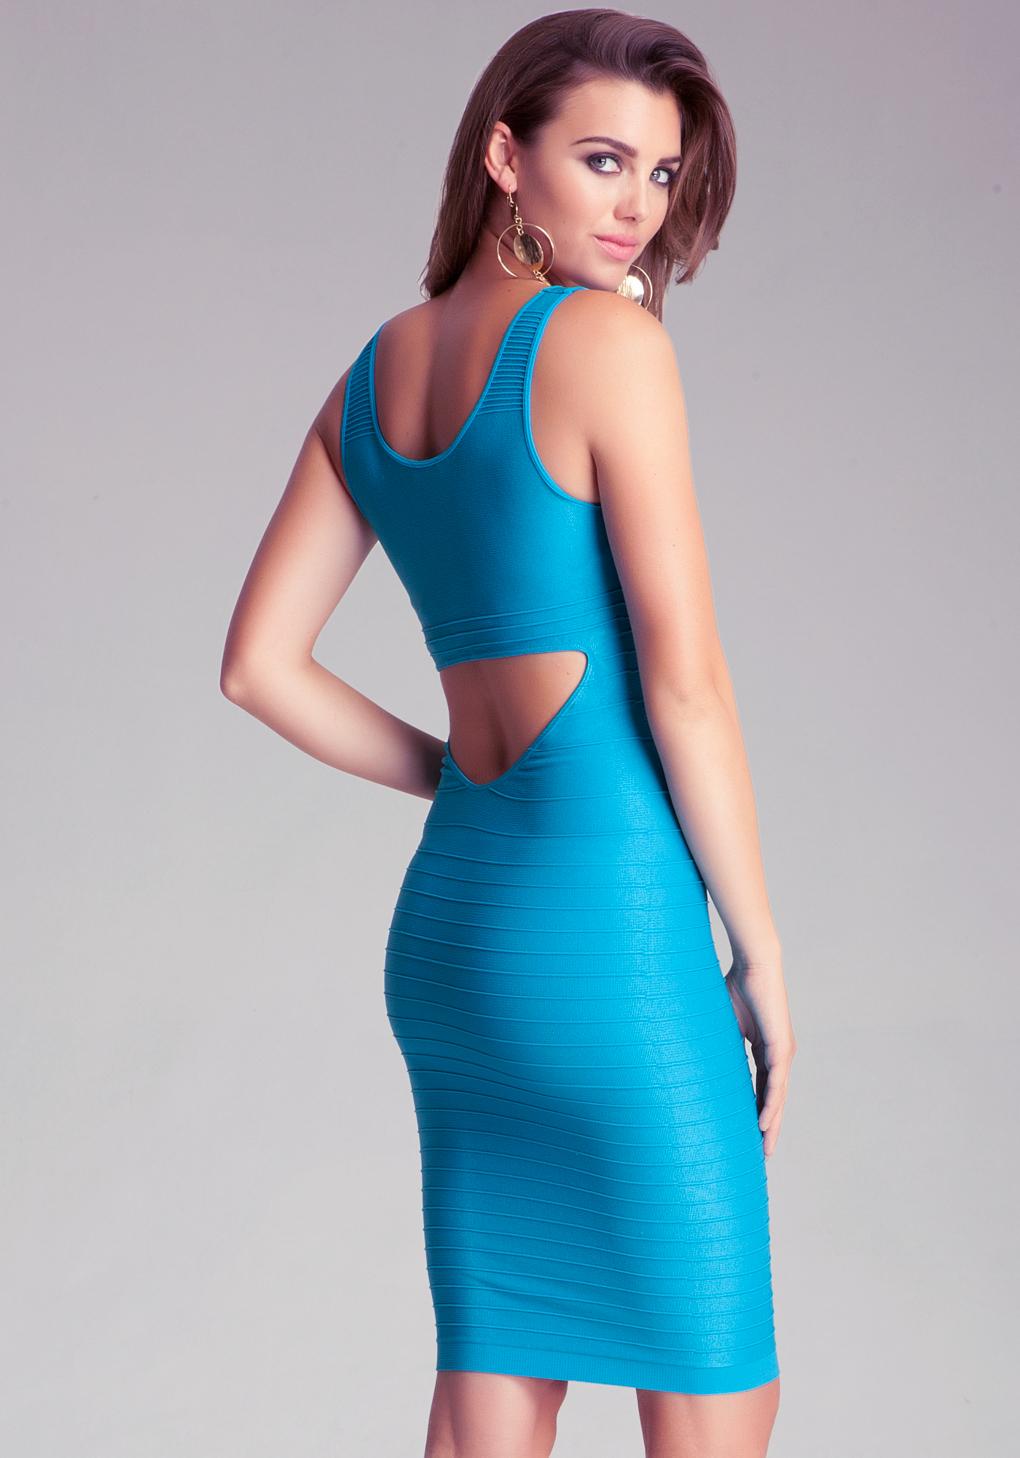 Lyst - Bebe Midi Back Cutout Shine Dress in Blue